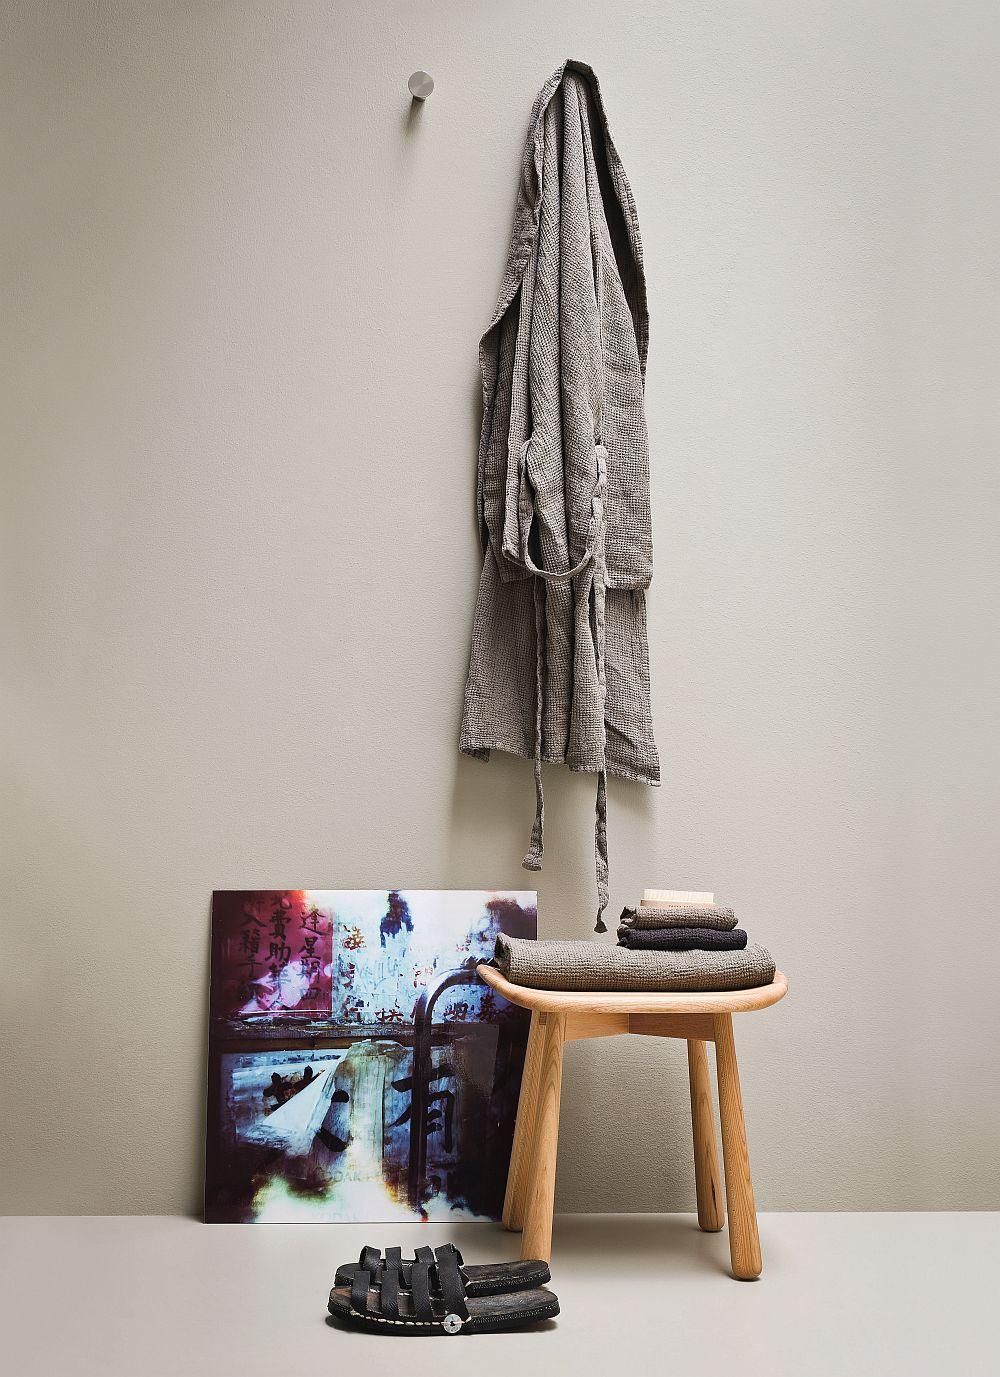 Simple shower stool designed by Monica Graffeo